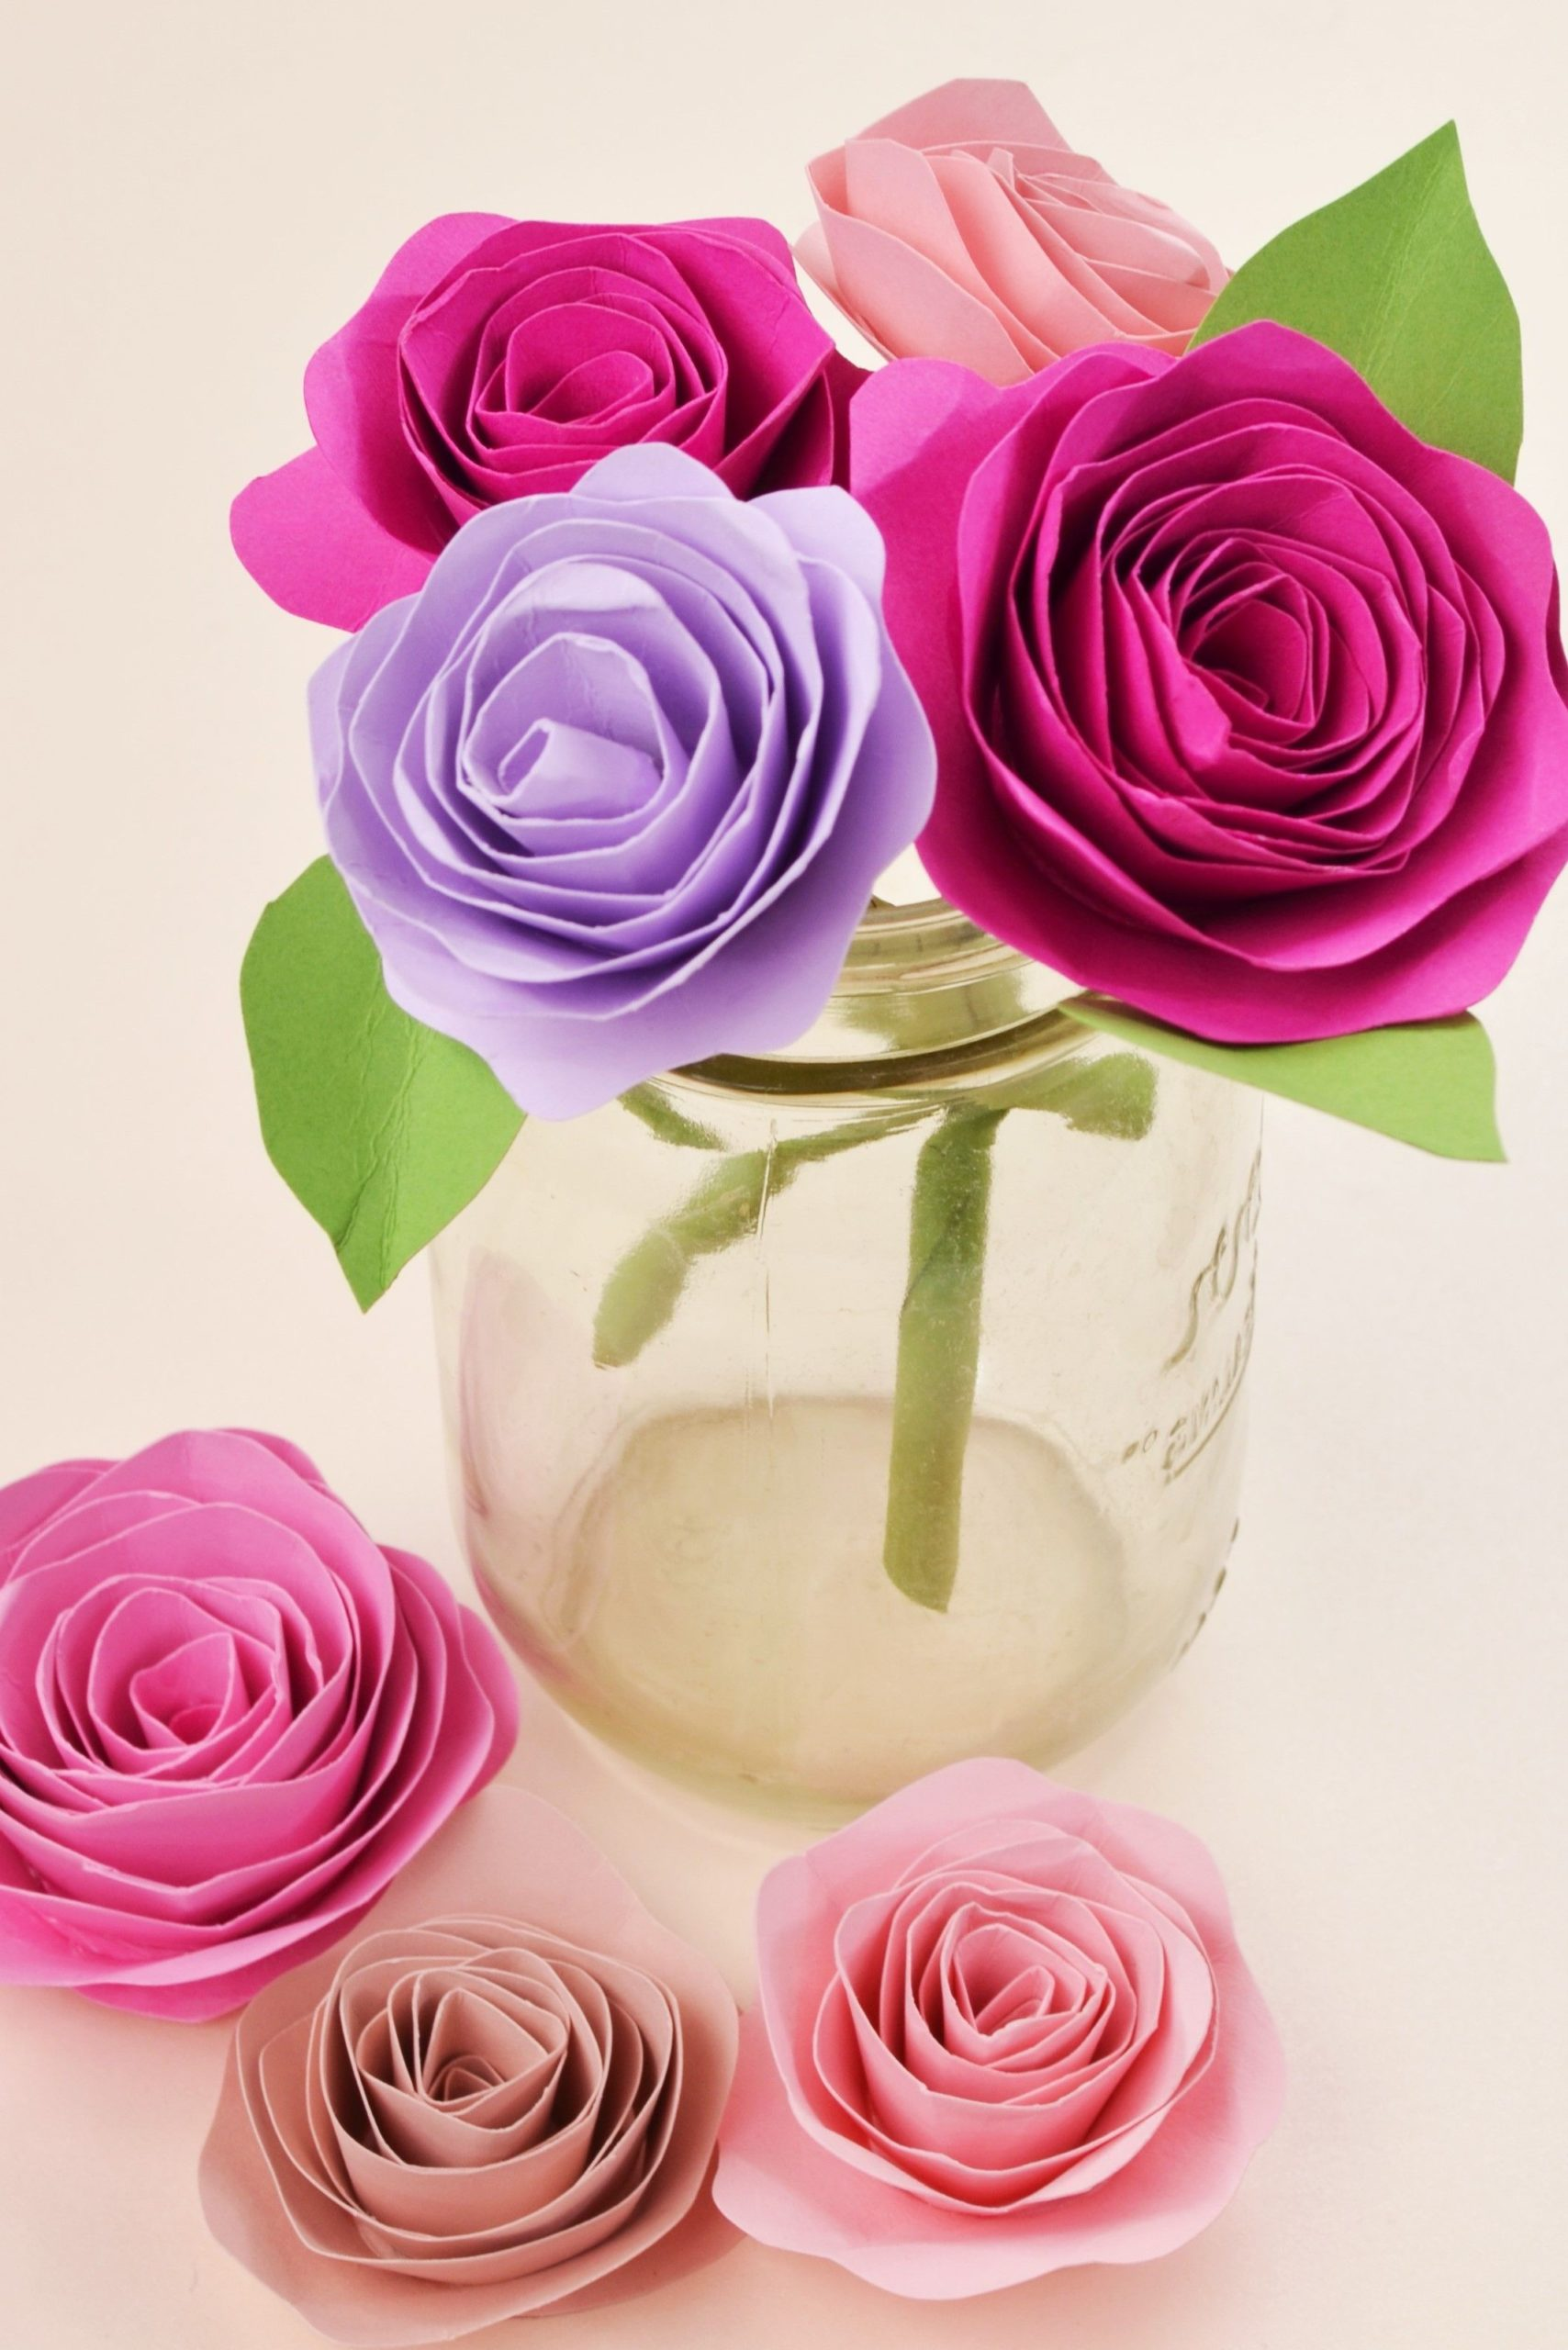 Roses en papier bricolage.